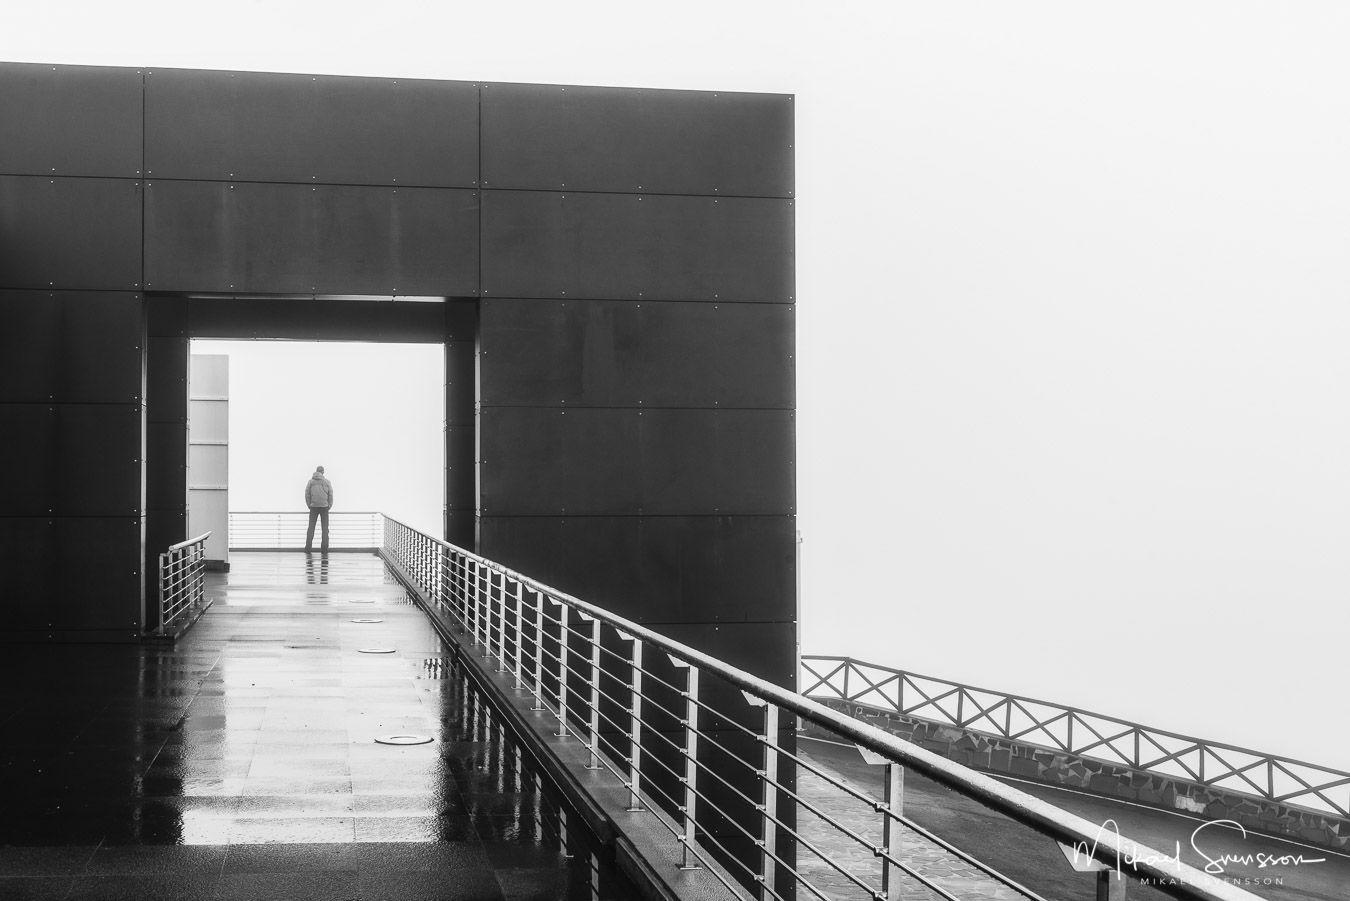 6 November 2016. Pico Do Arieiro Madeira. #mikaelsvenssonphotography #madeira #madeiralovers #madeiraisland #madeira_islands #visitmadeira #ig_masterpiece #ig_mood #madeirabest #discovermadeira #ilovemadeira #nikonpro #embracethemoment #adventureisoutthere #picodoarieiro #bnw_life #foto_blackwhite #bnw_sweden #bw_perfect #bnw_planet #bw_divine #monochromeart #monochromelovers #fineart_photobw #bnw_just #bnw_diamond #top_bnw #bw_fineart